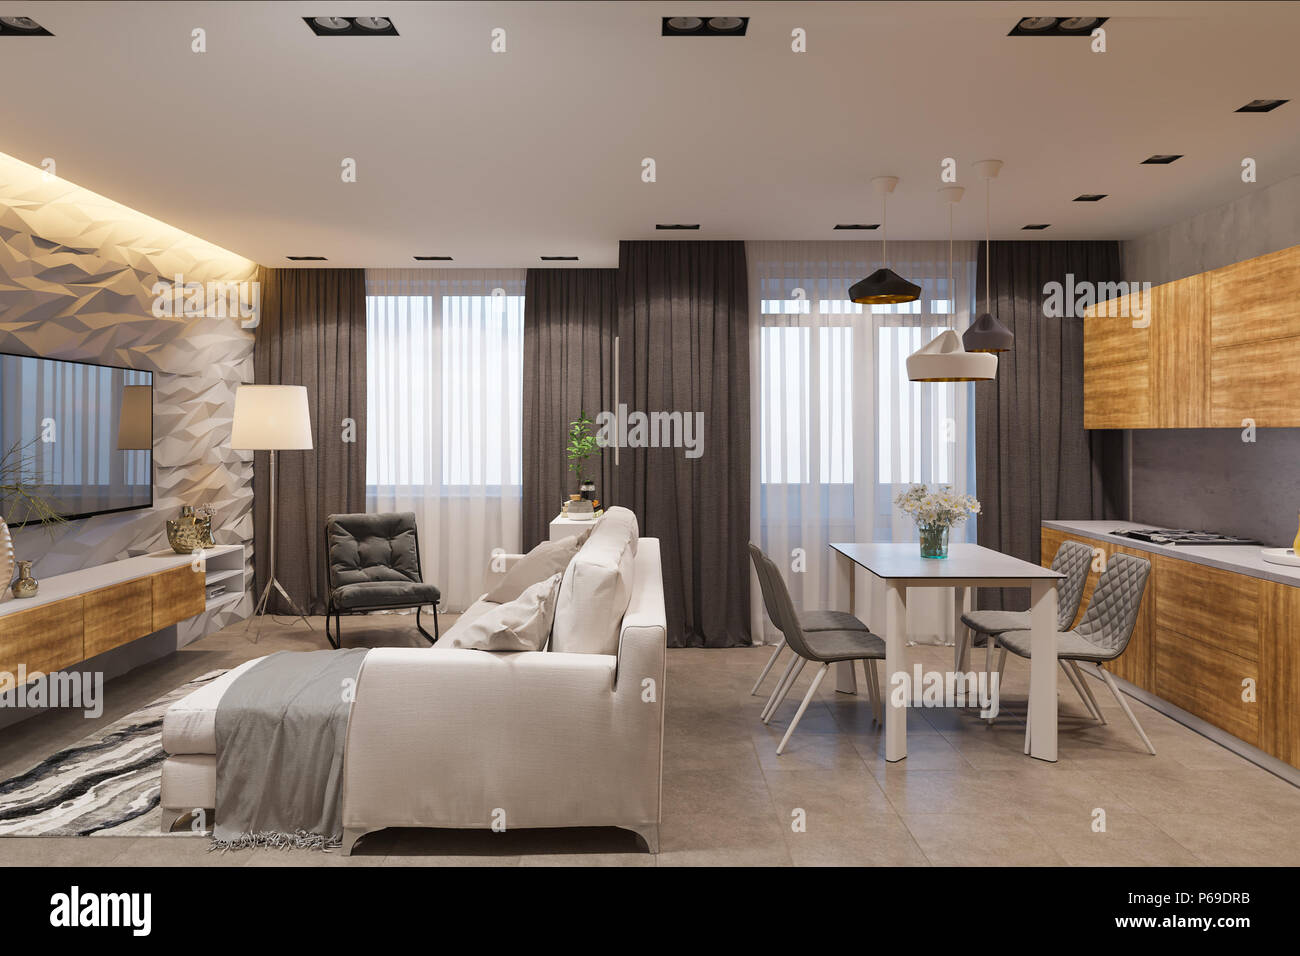 Pannelli decorativi cucina fasciatoio da vasca pannelli pareti cucina e gallery of fasciatoio - Pannelli decorativi per cucina ...